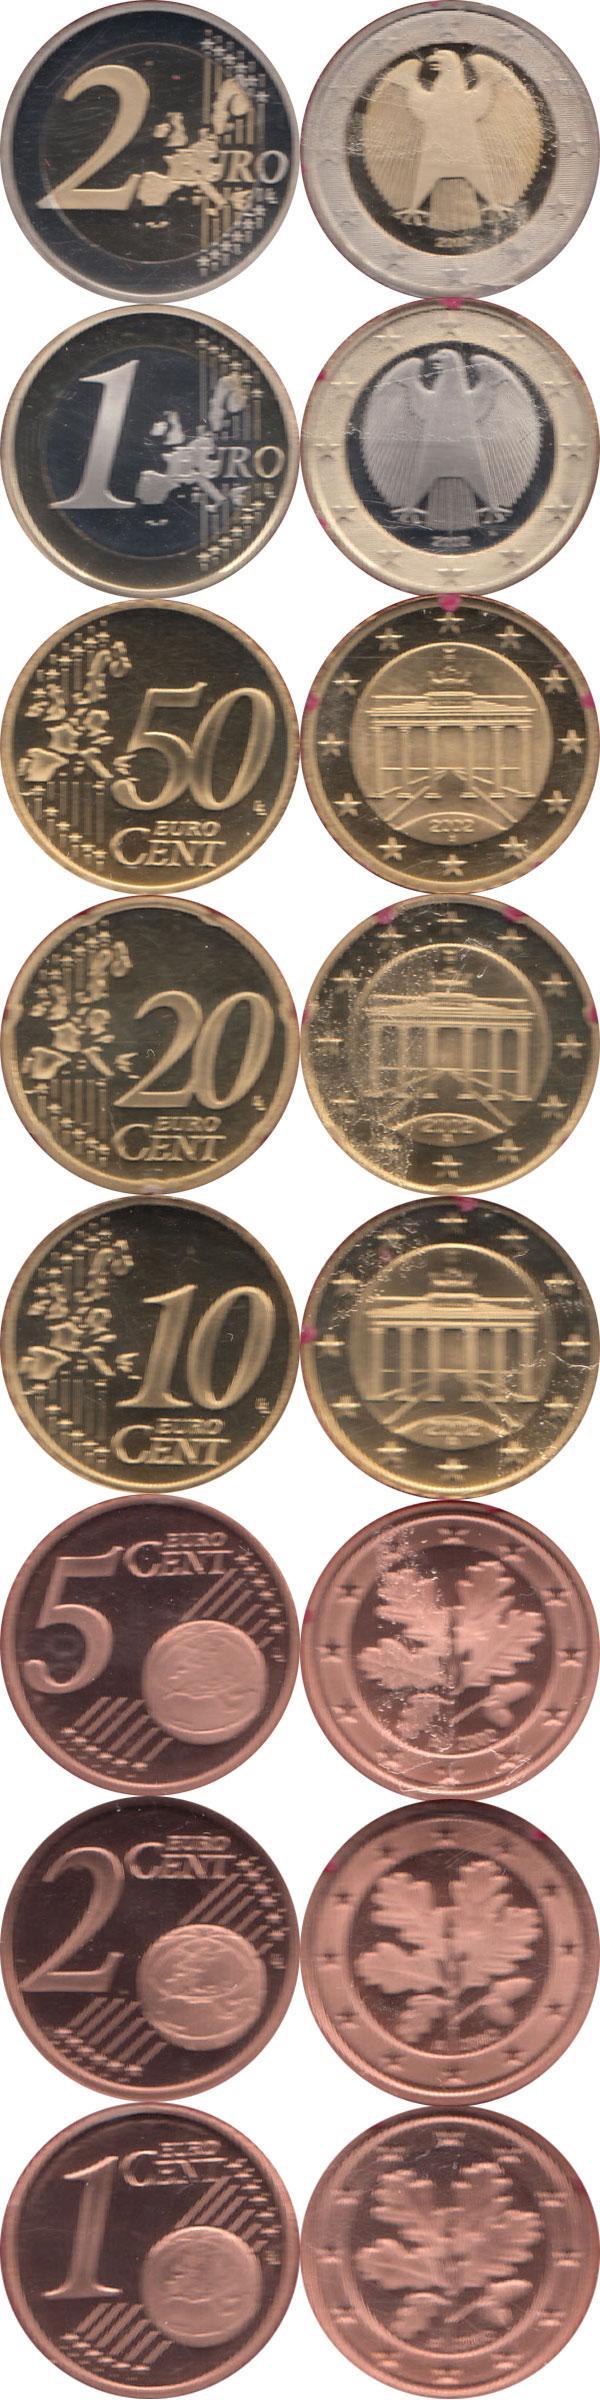 Каталог монет - Германия Евронабор 2002, Чеканка Берлин